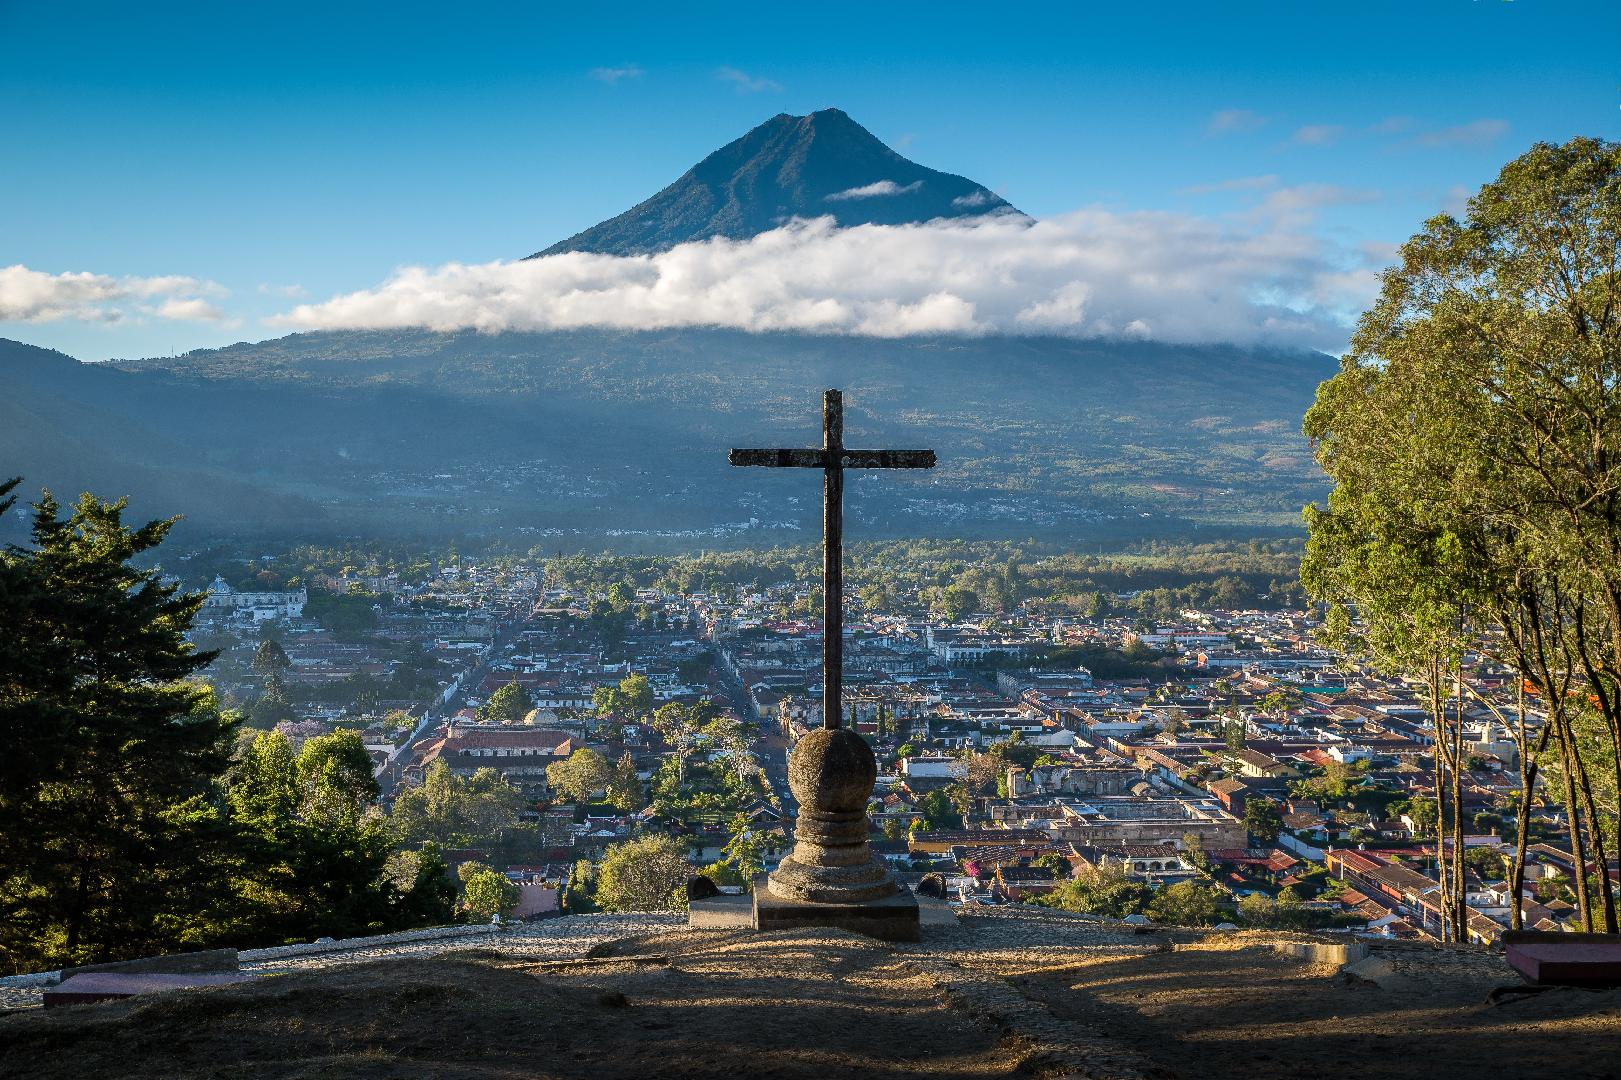 Guatemala, Agua Volcano, Cerro de la Cruz